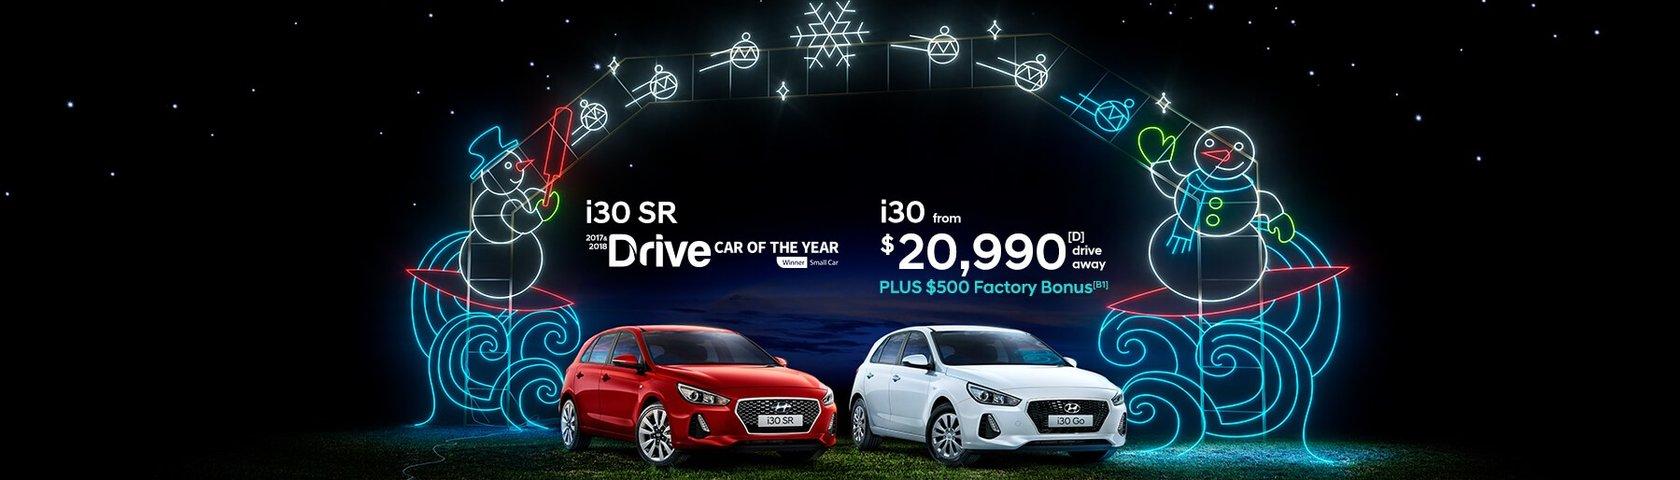 Pennant Hills Hyundai - Christmas Special